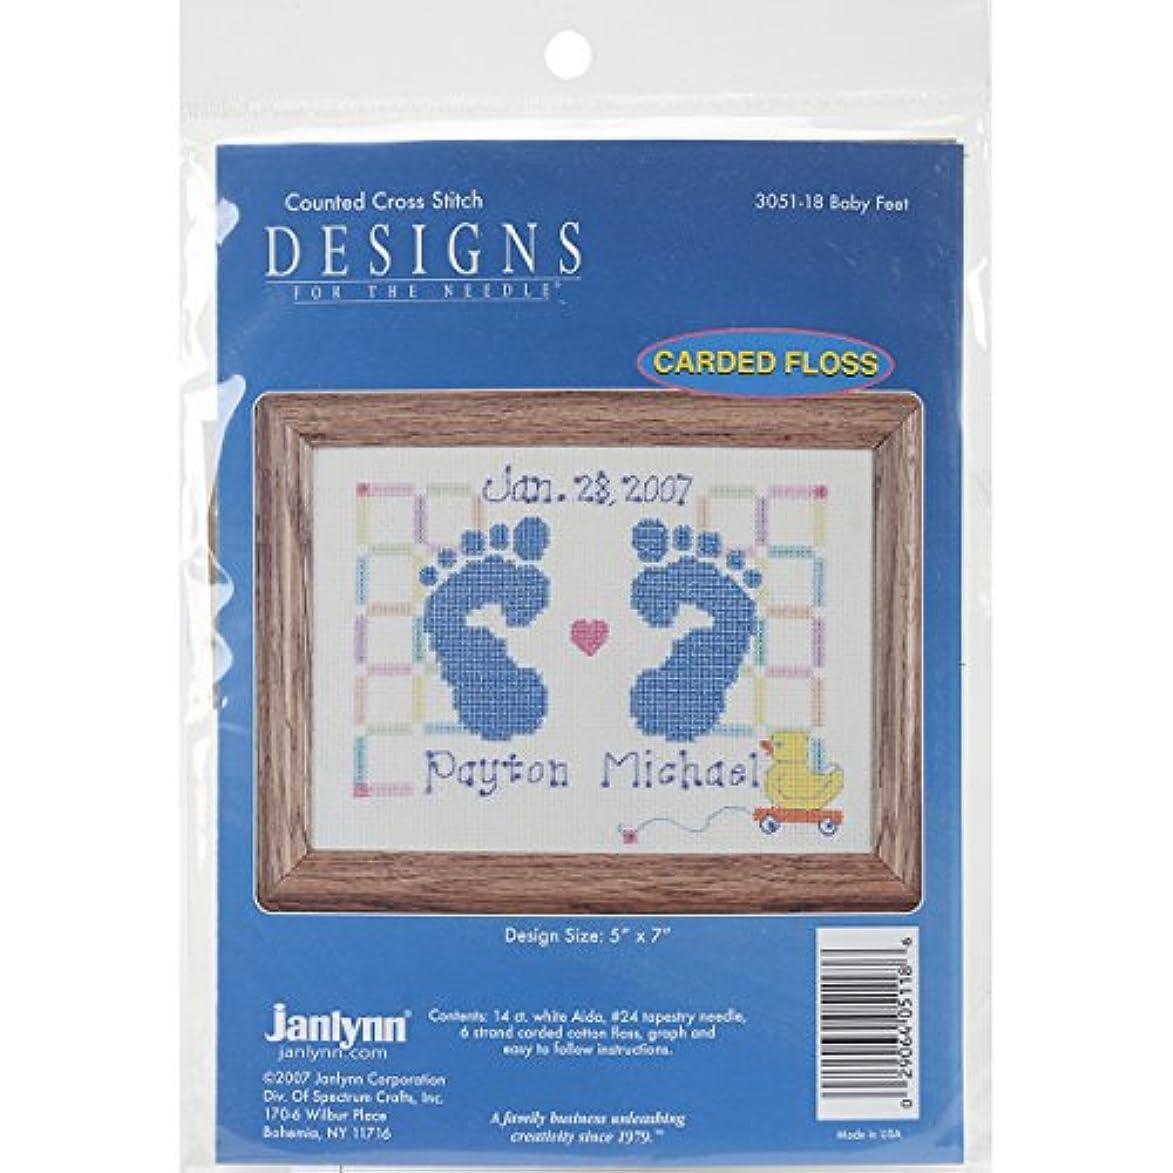 Janlynn Counted Cross Stitch Kit, Baby Feet Birth Announcement rlk069445783378